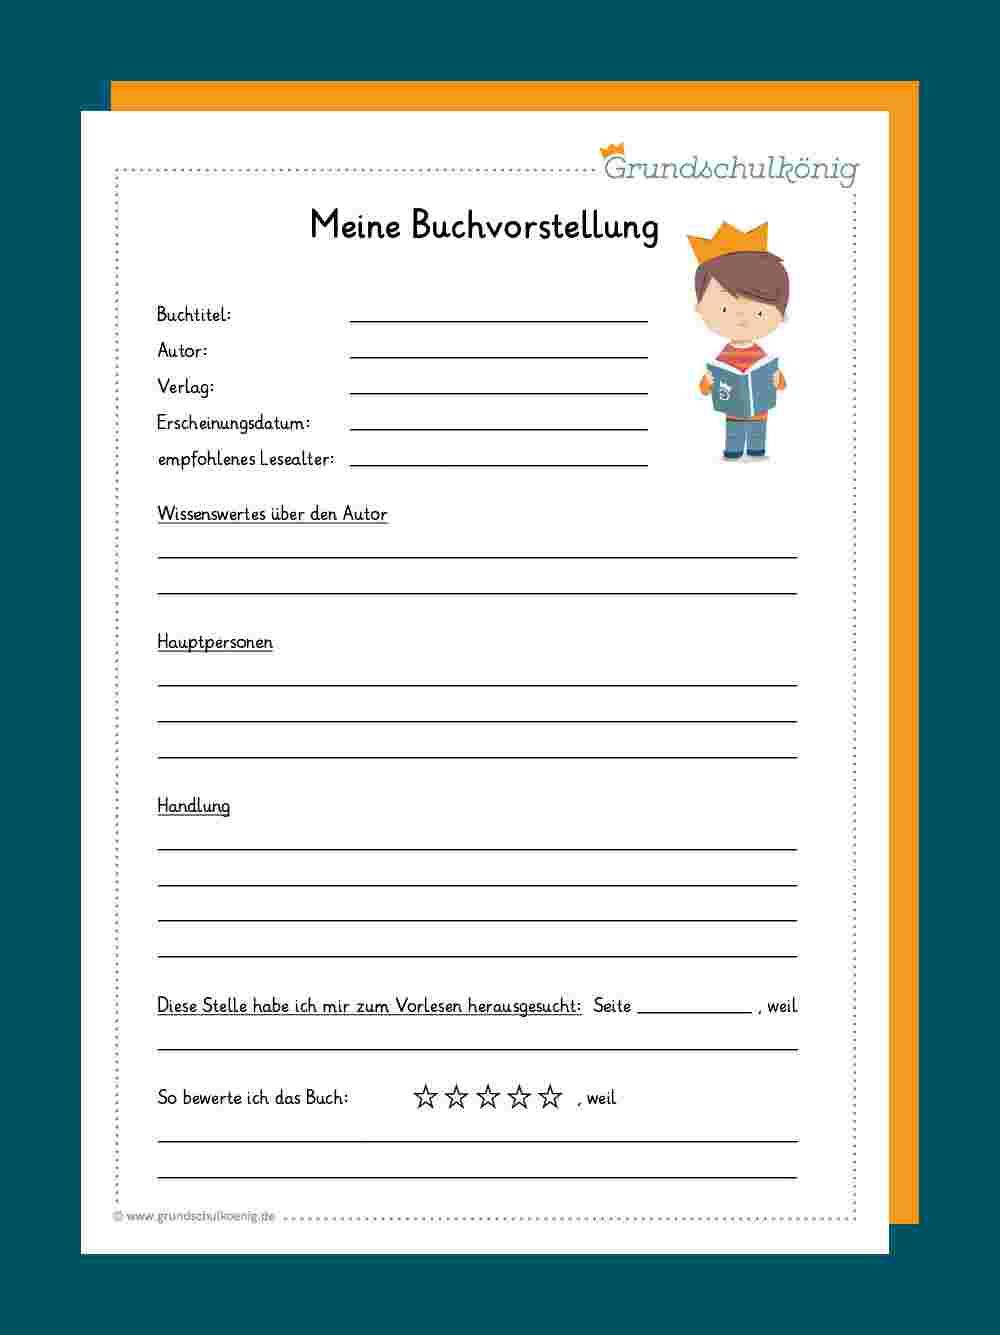 7 Buchvorstellung Grundschule Ideen Buchvorstellung 1